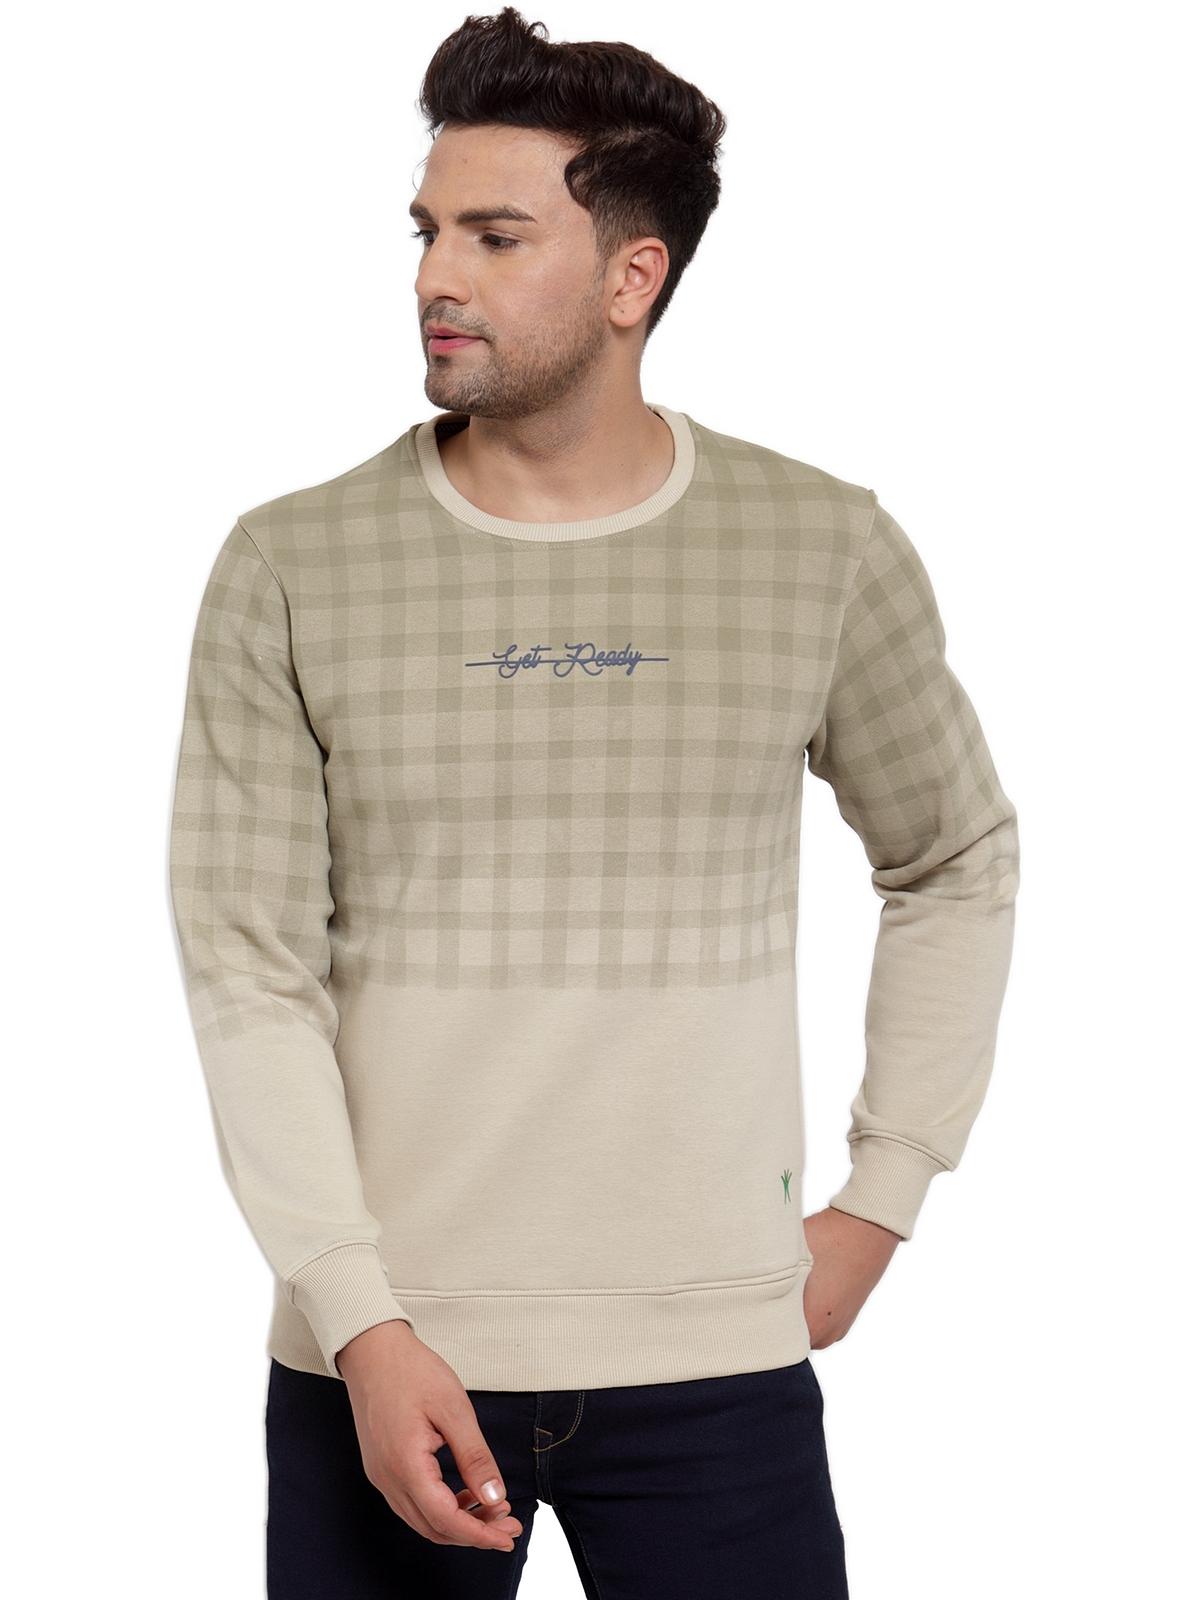 VENITIAN   Venitian Mens Light Olive Printed Round Neck Sweat-Shirt